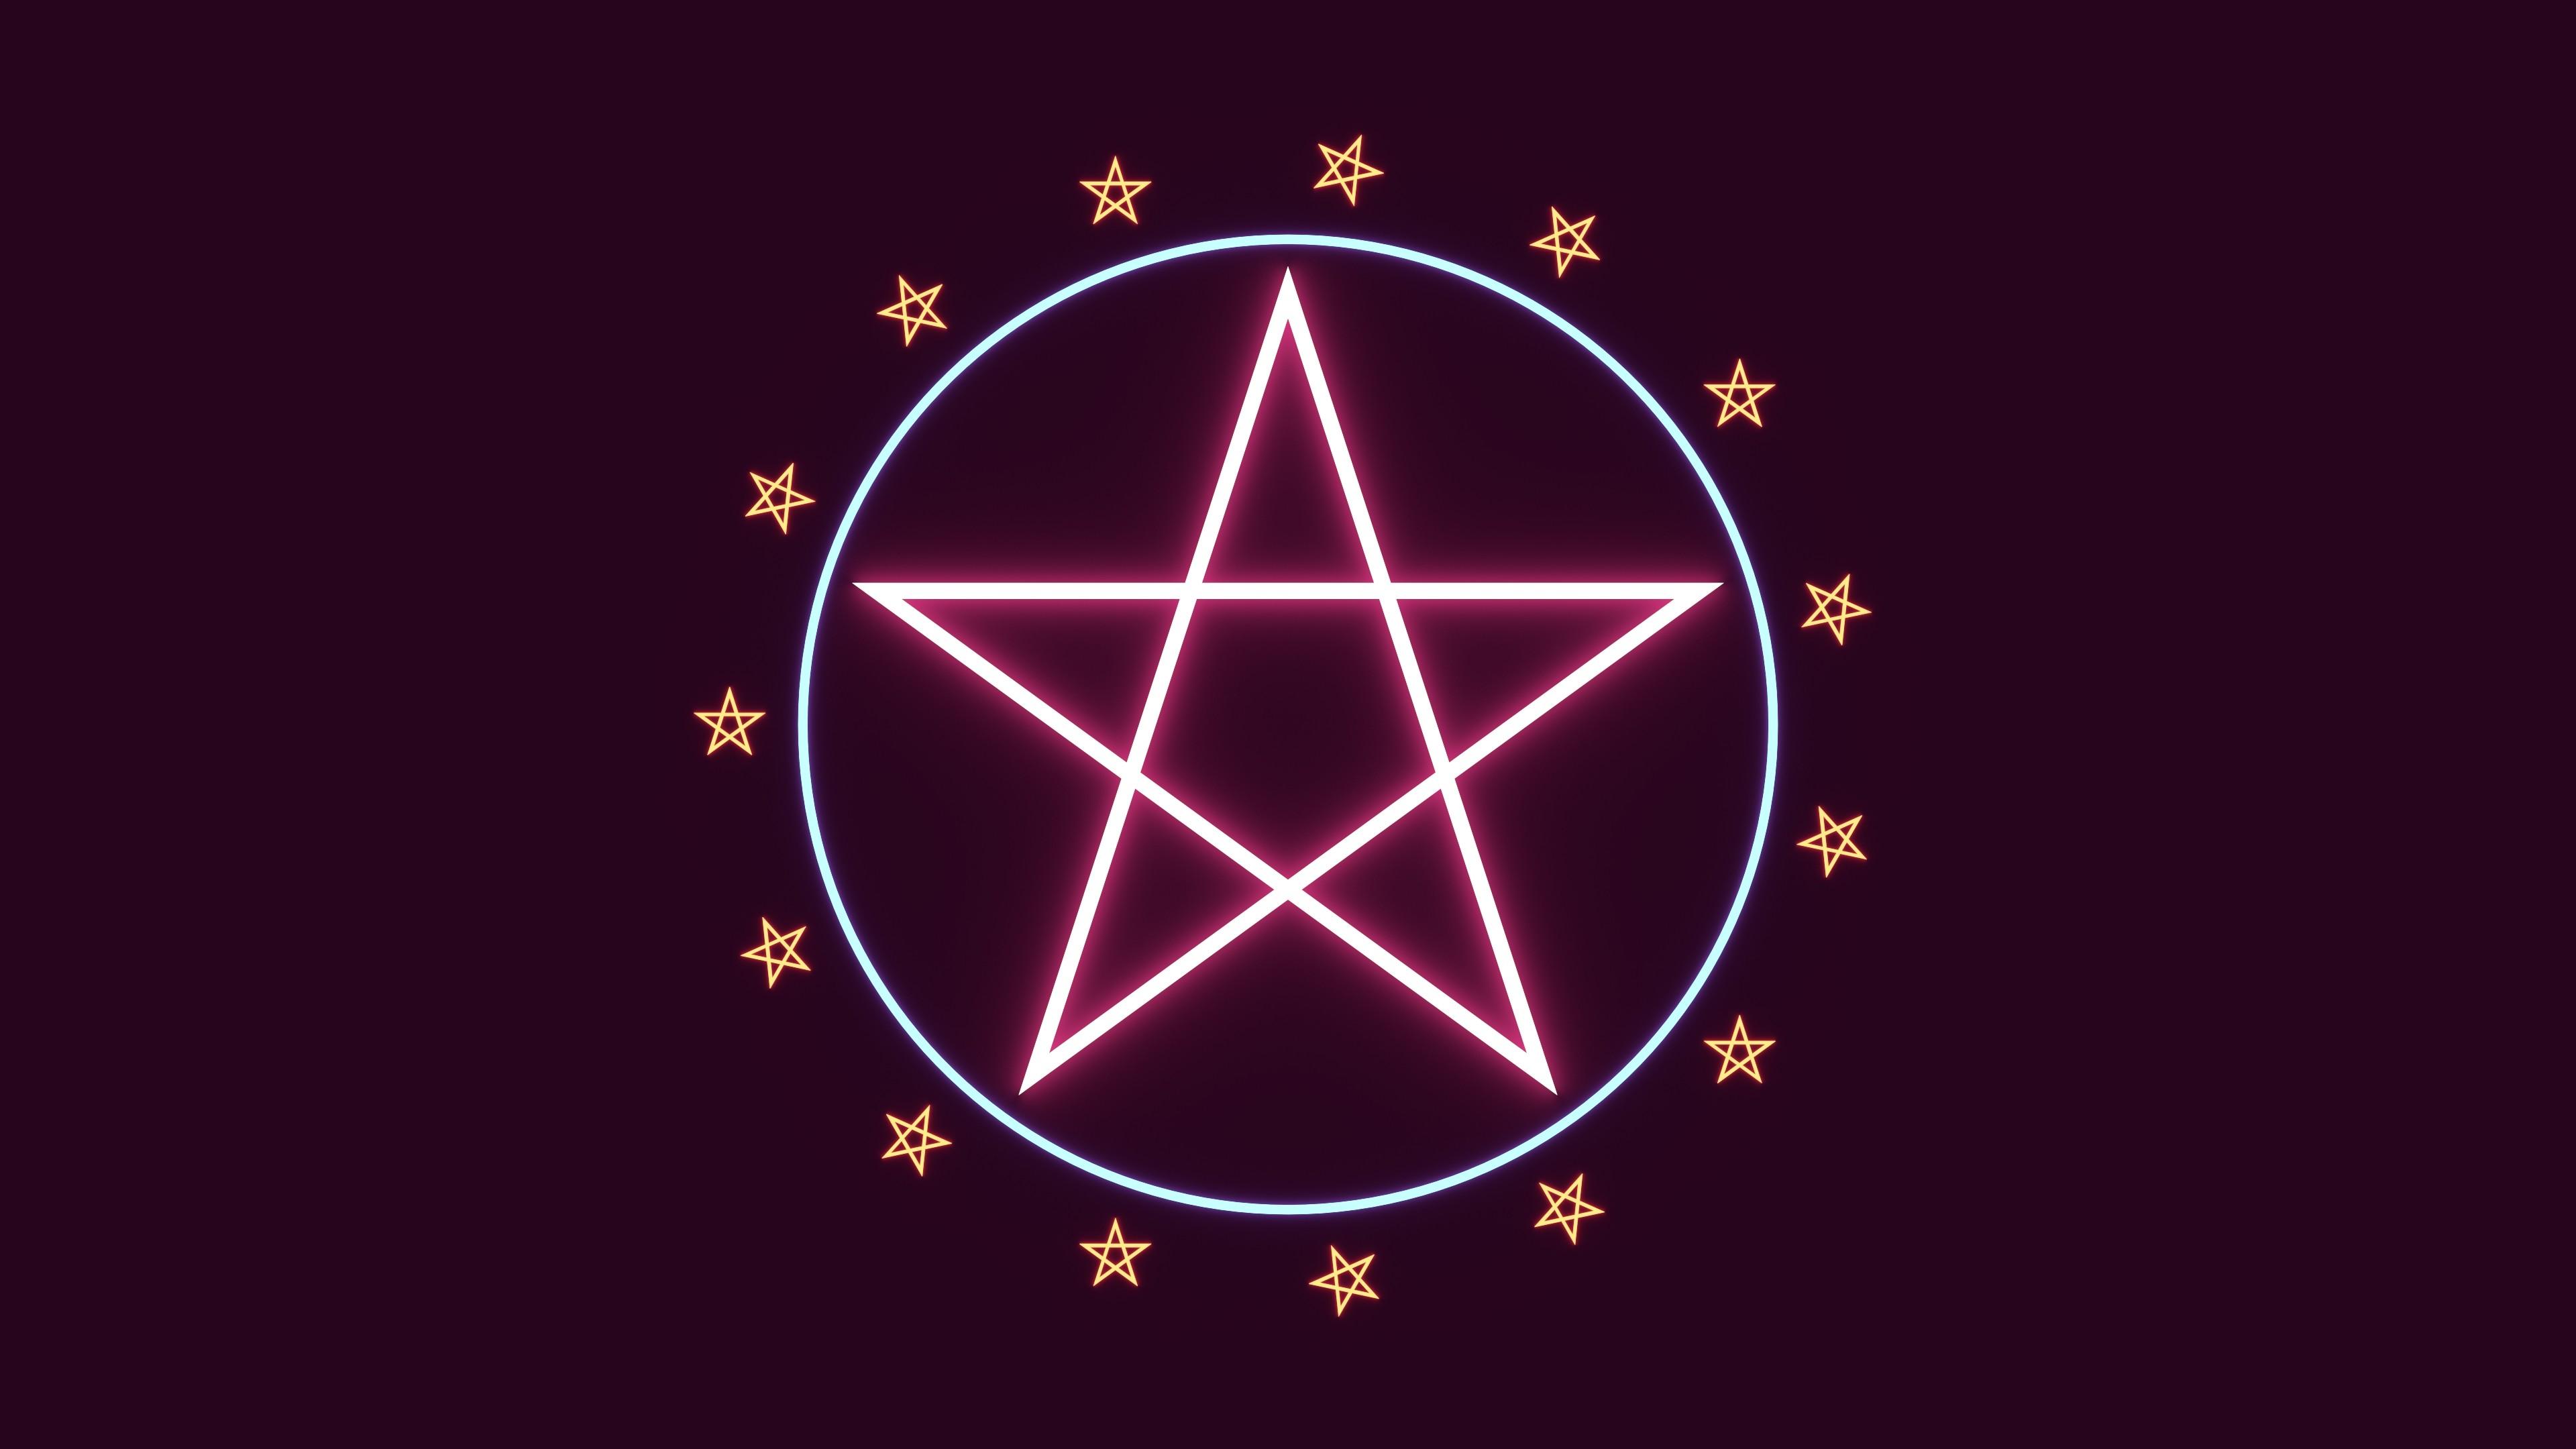 Pentagram Wallpaper 48 Images